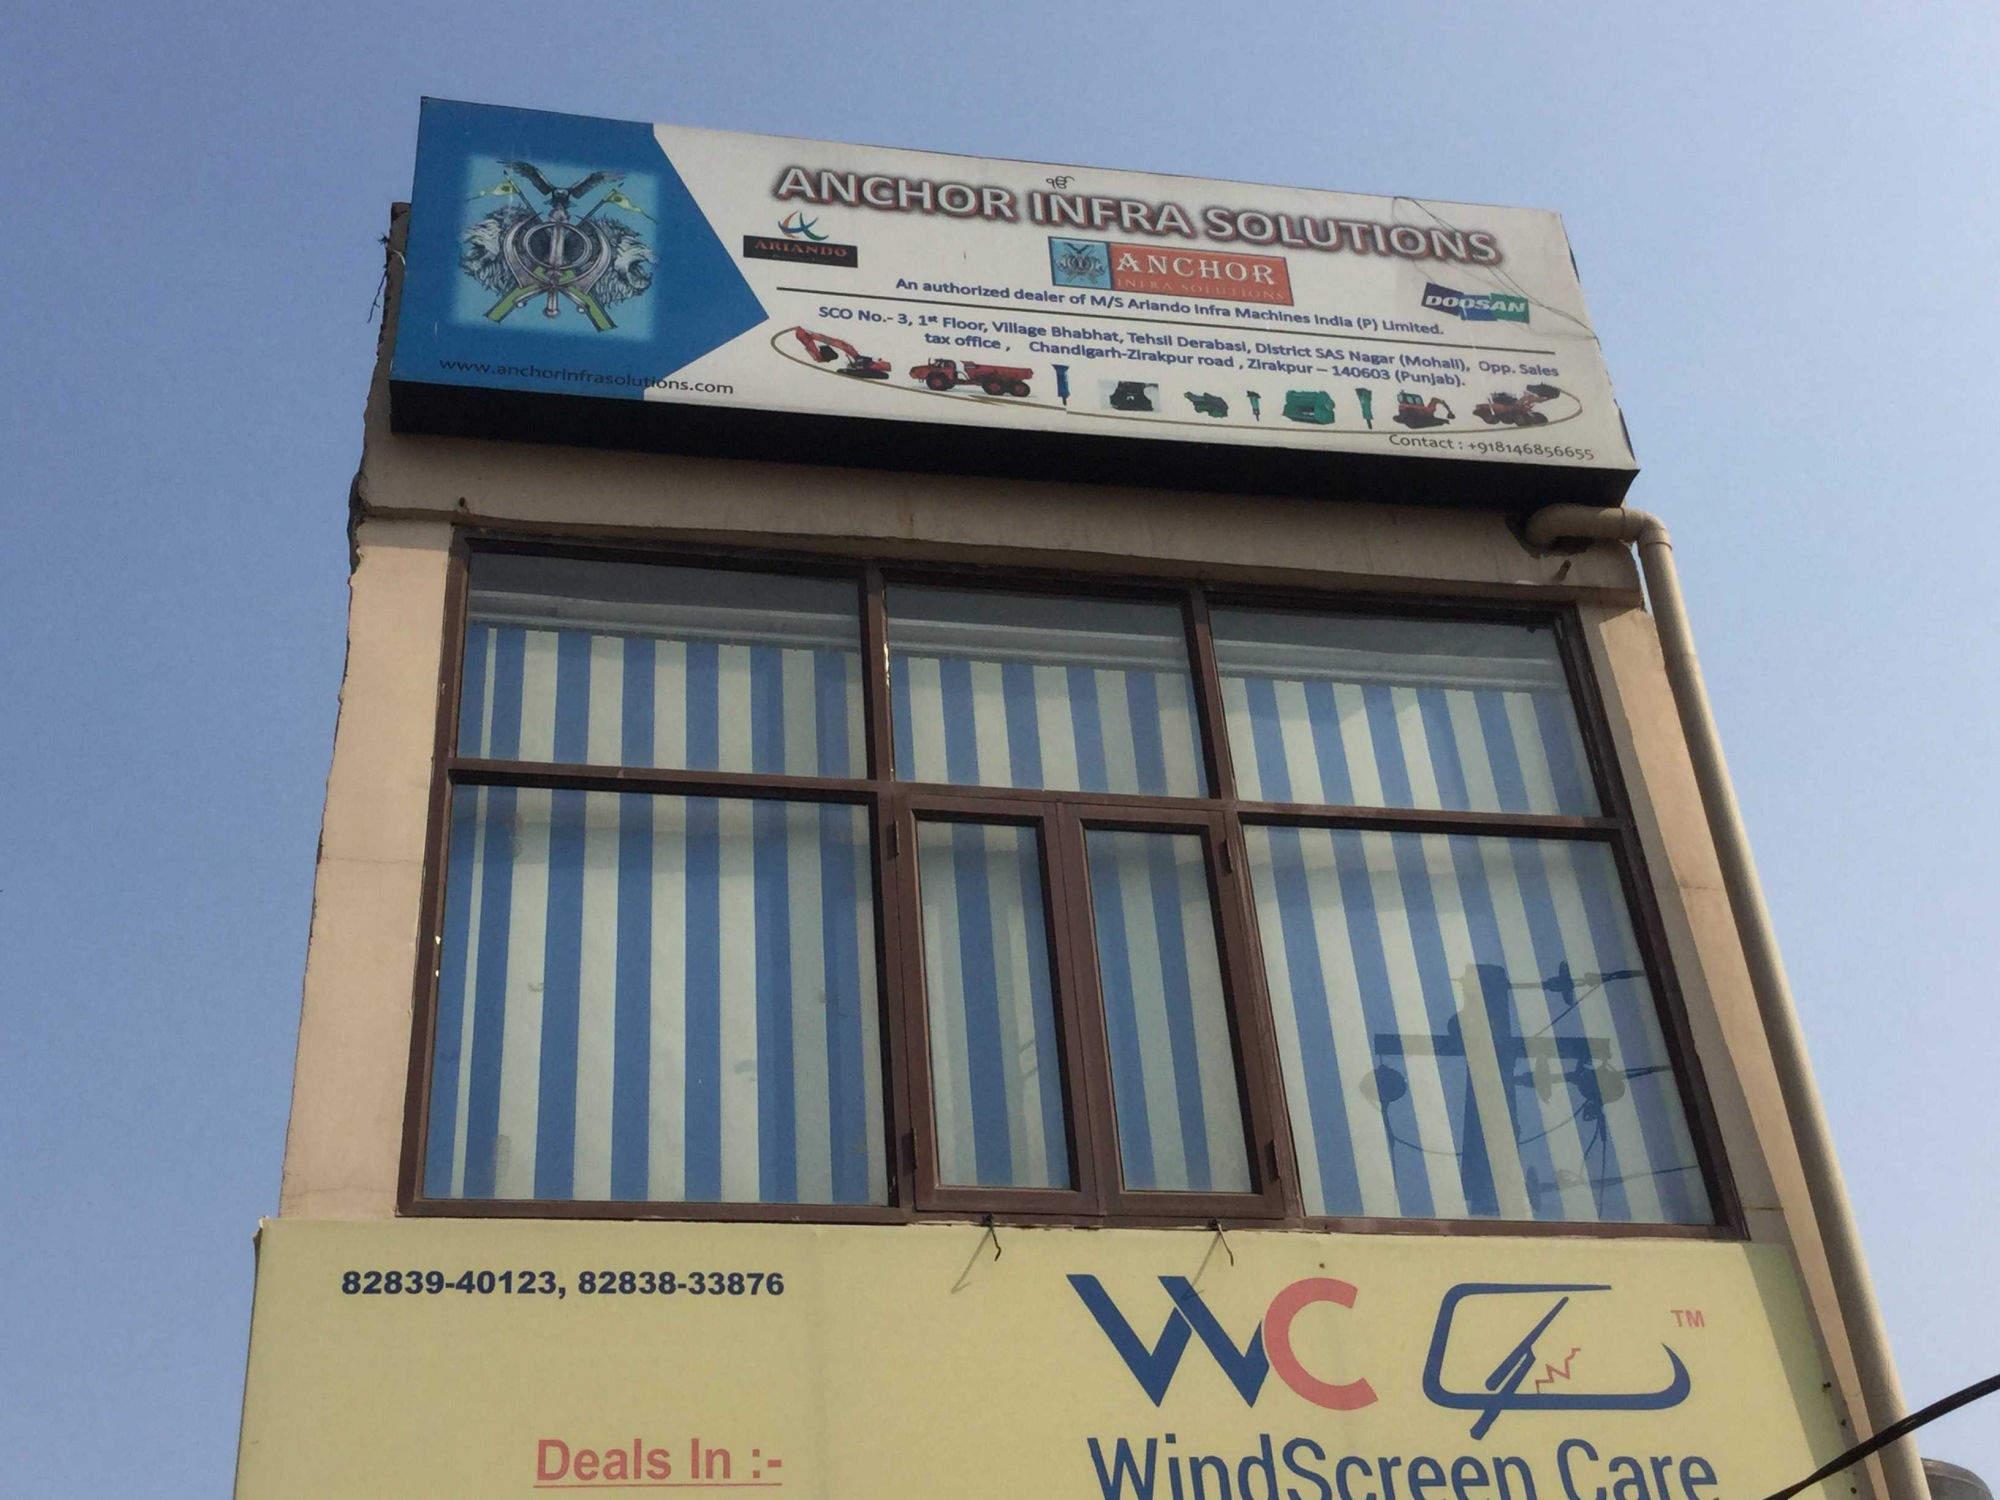 Top Caterpillar Earthmover Dealers in Chandigarh - Best